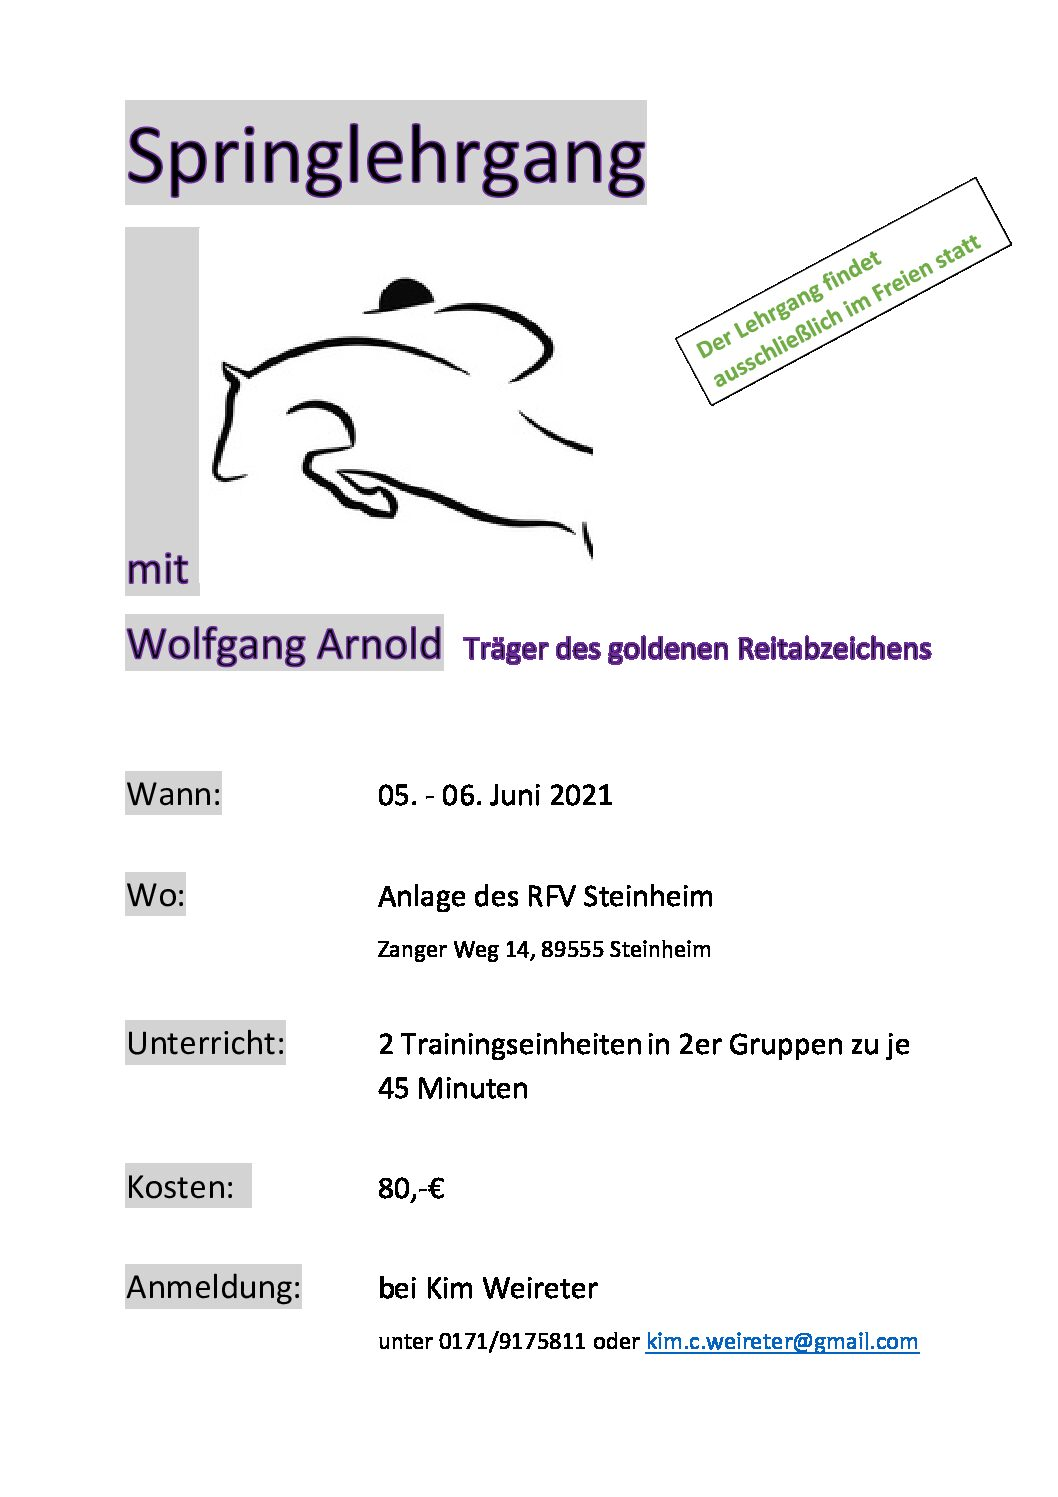 Springlehrgang mit Wolfgang Arnold in Steinheim